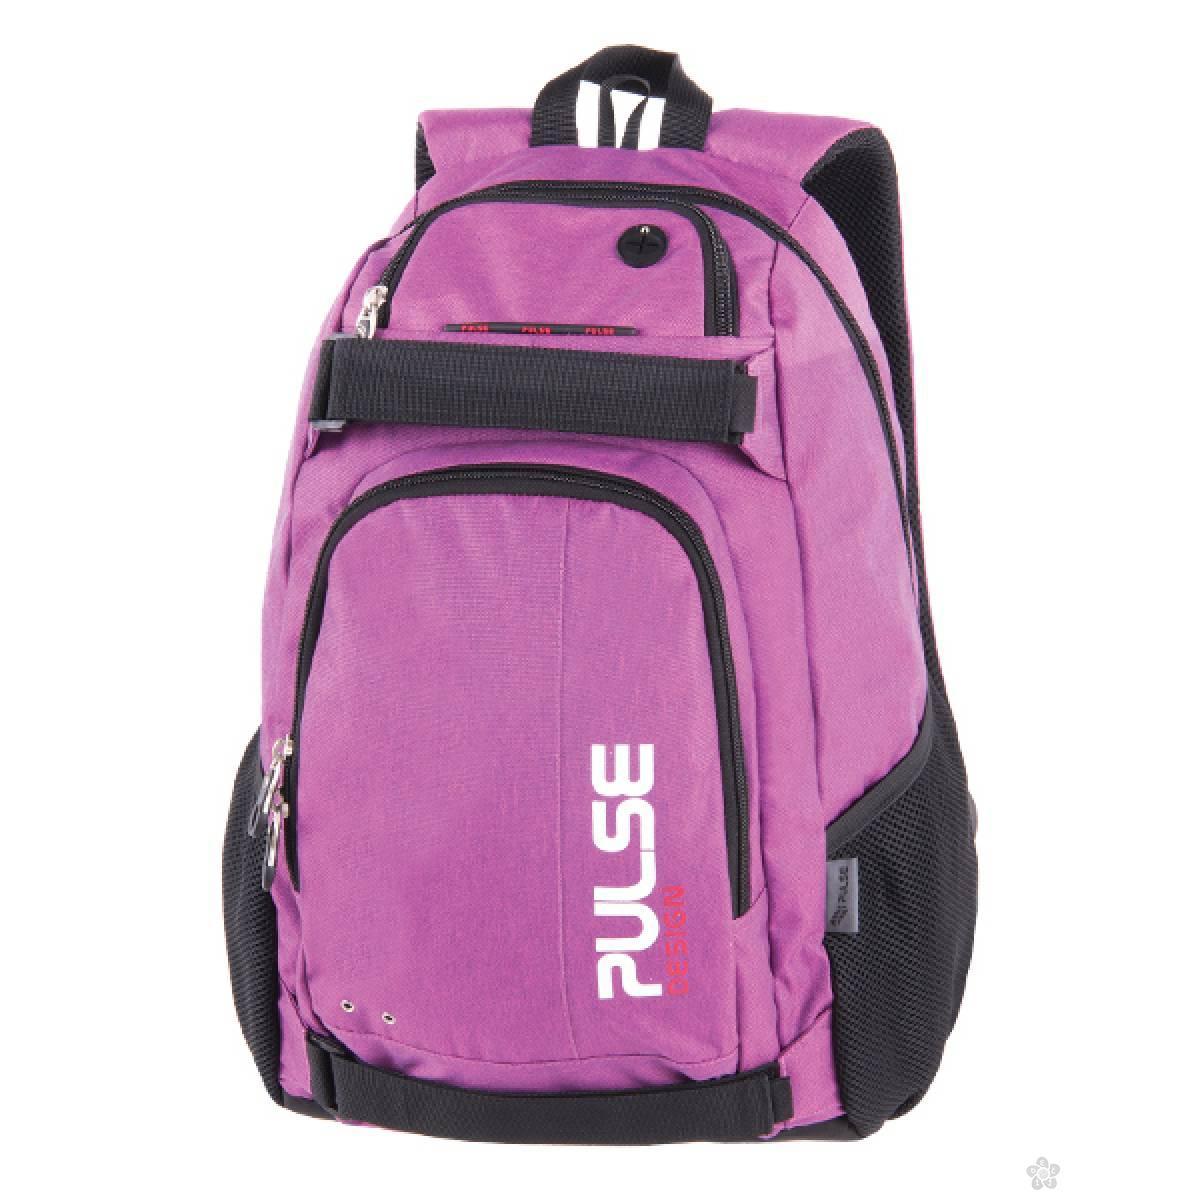 Ranac Scate Purple Cationic 121791